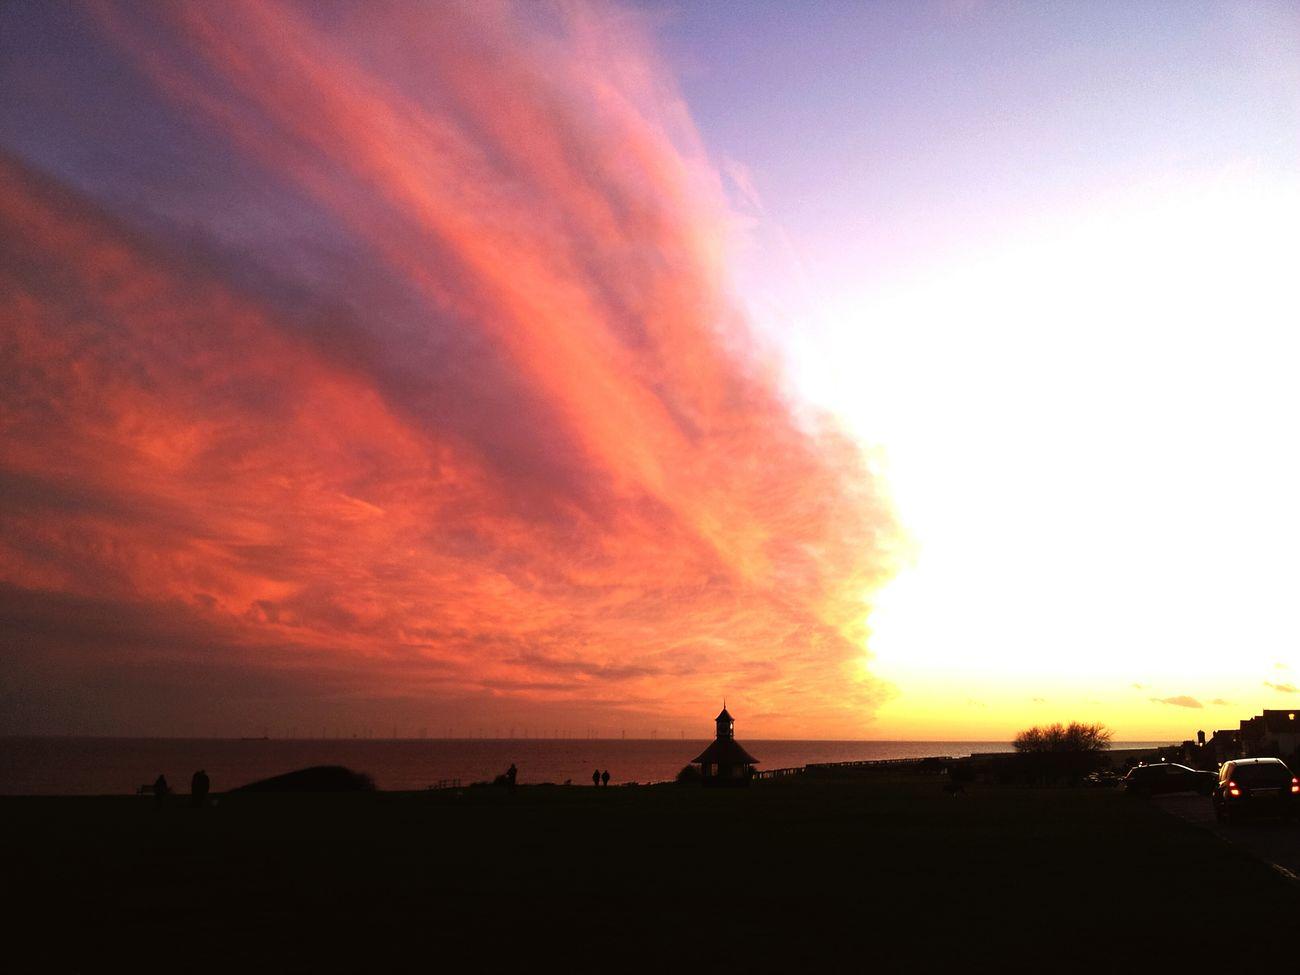 Frinton on sea Sky_scapes Sky Porn Clouds And Sky Sunset Seascape Seaside Sunlight Frinton-on-Sea Frinton Frinton On Sea